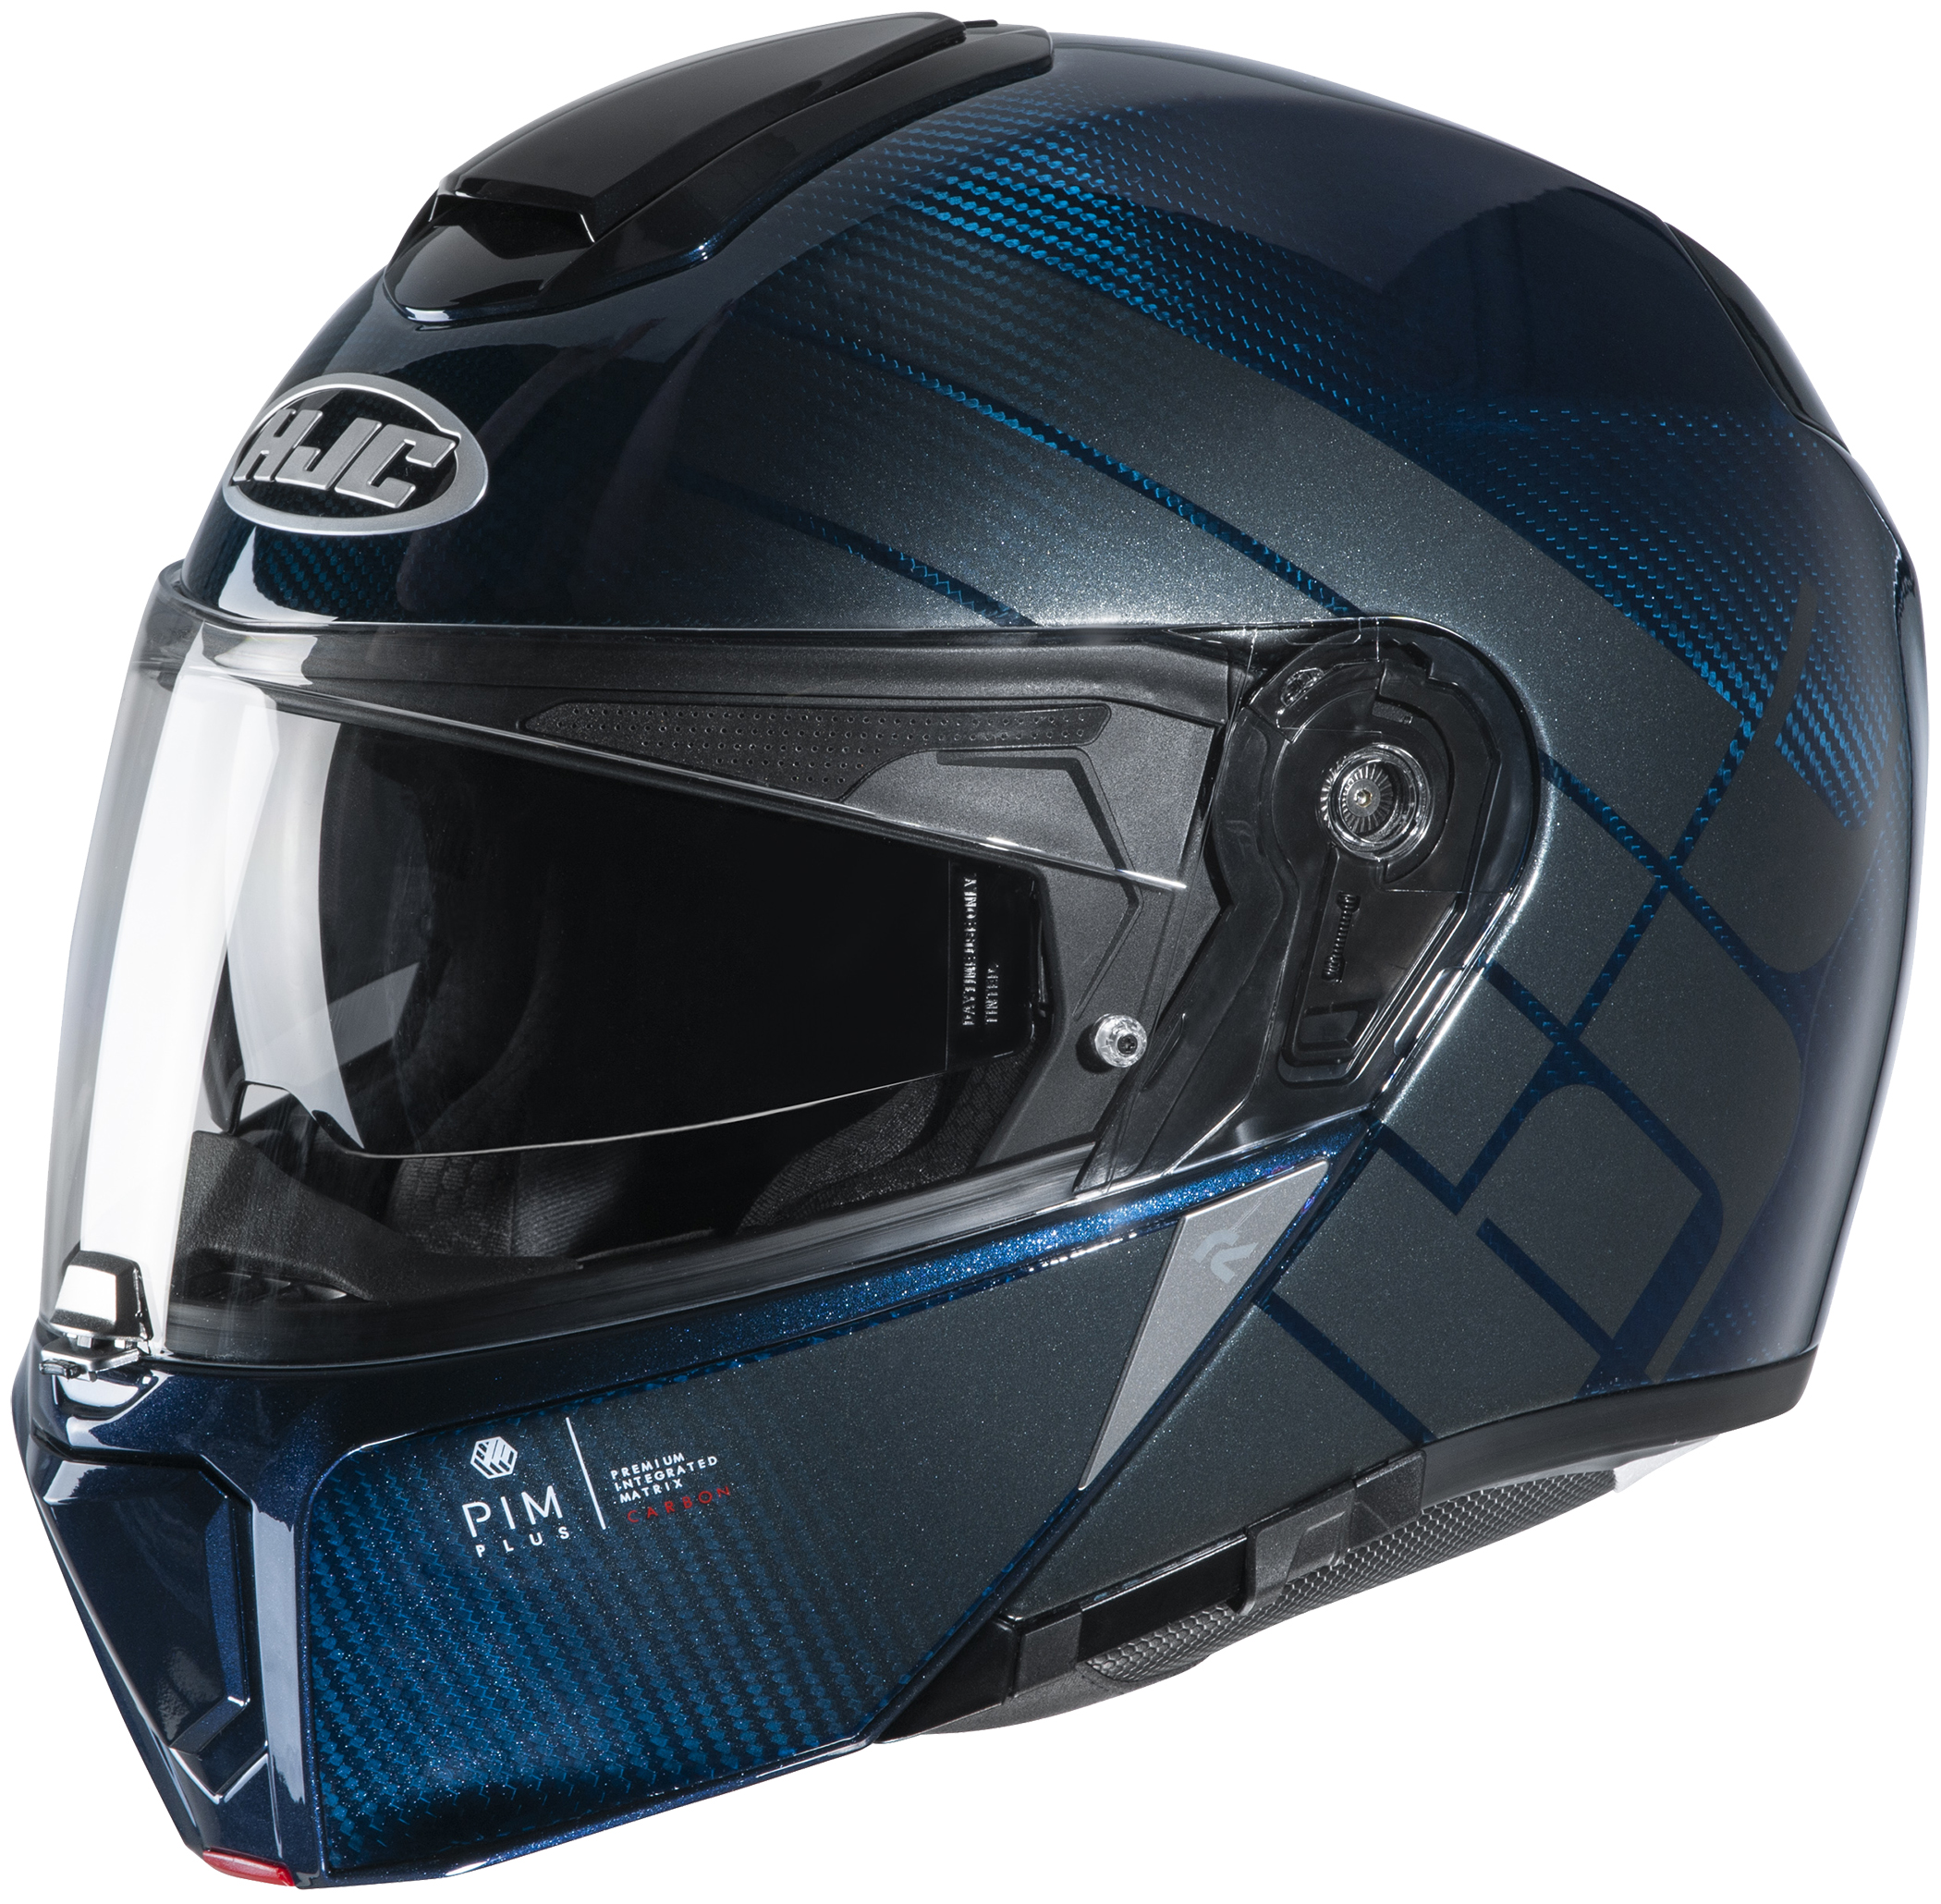 hjc rpha 90s carbon fiber balian mc2 modular helmet. Black Bedroom Furniture Sets. Home Design Ideas